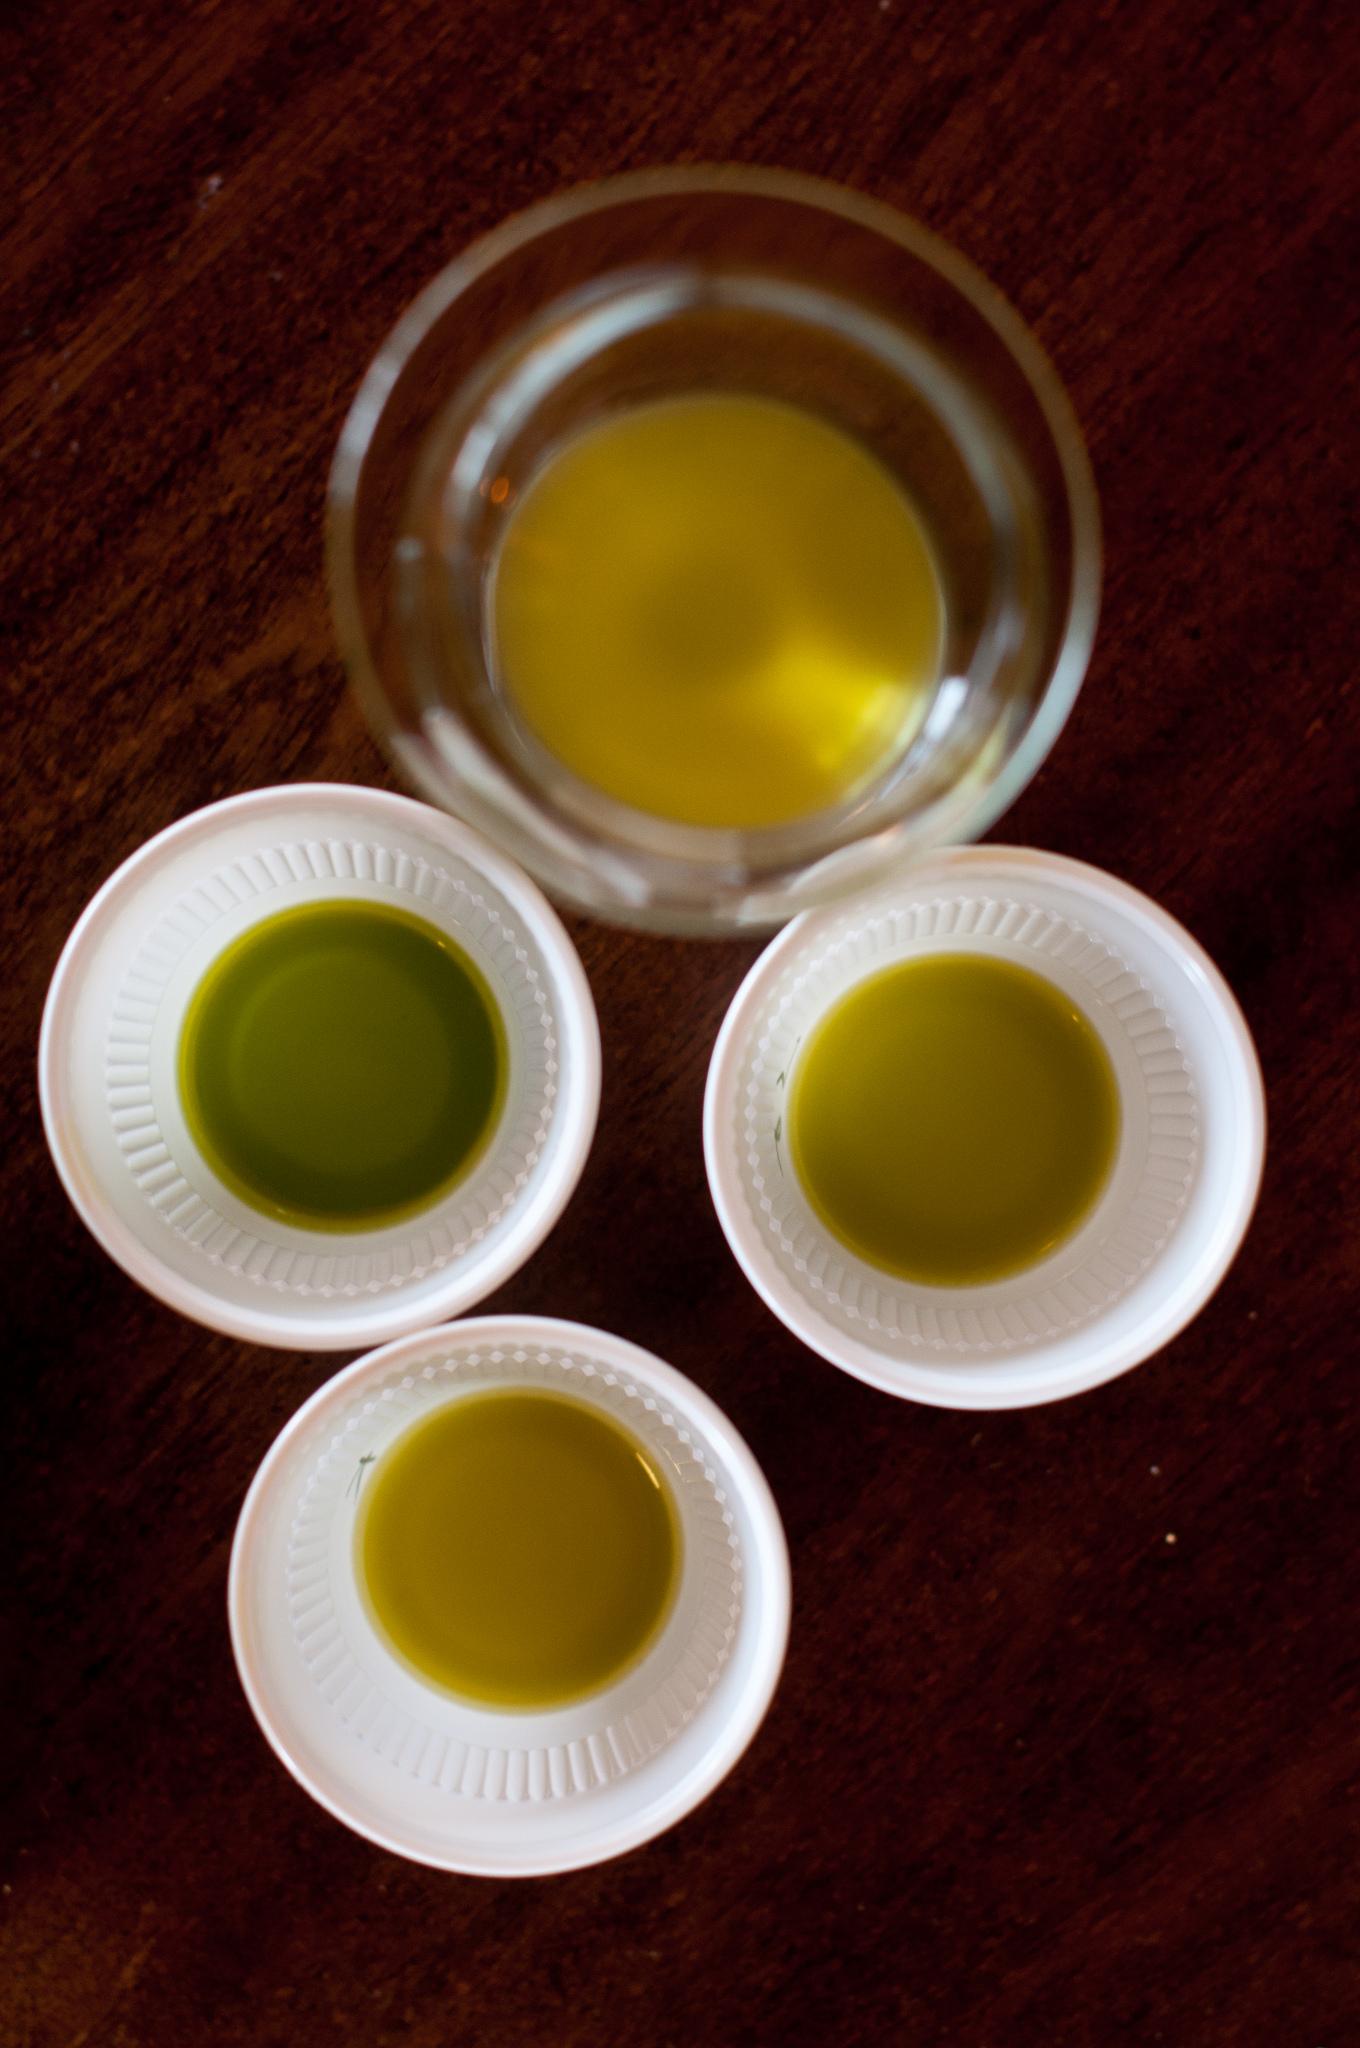 Mani Bio-Olivenöl grasgrünes Öl Griechenland